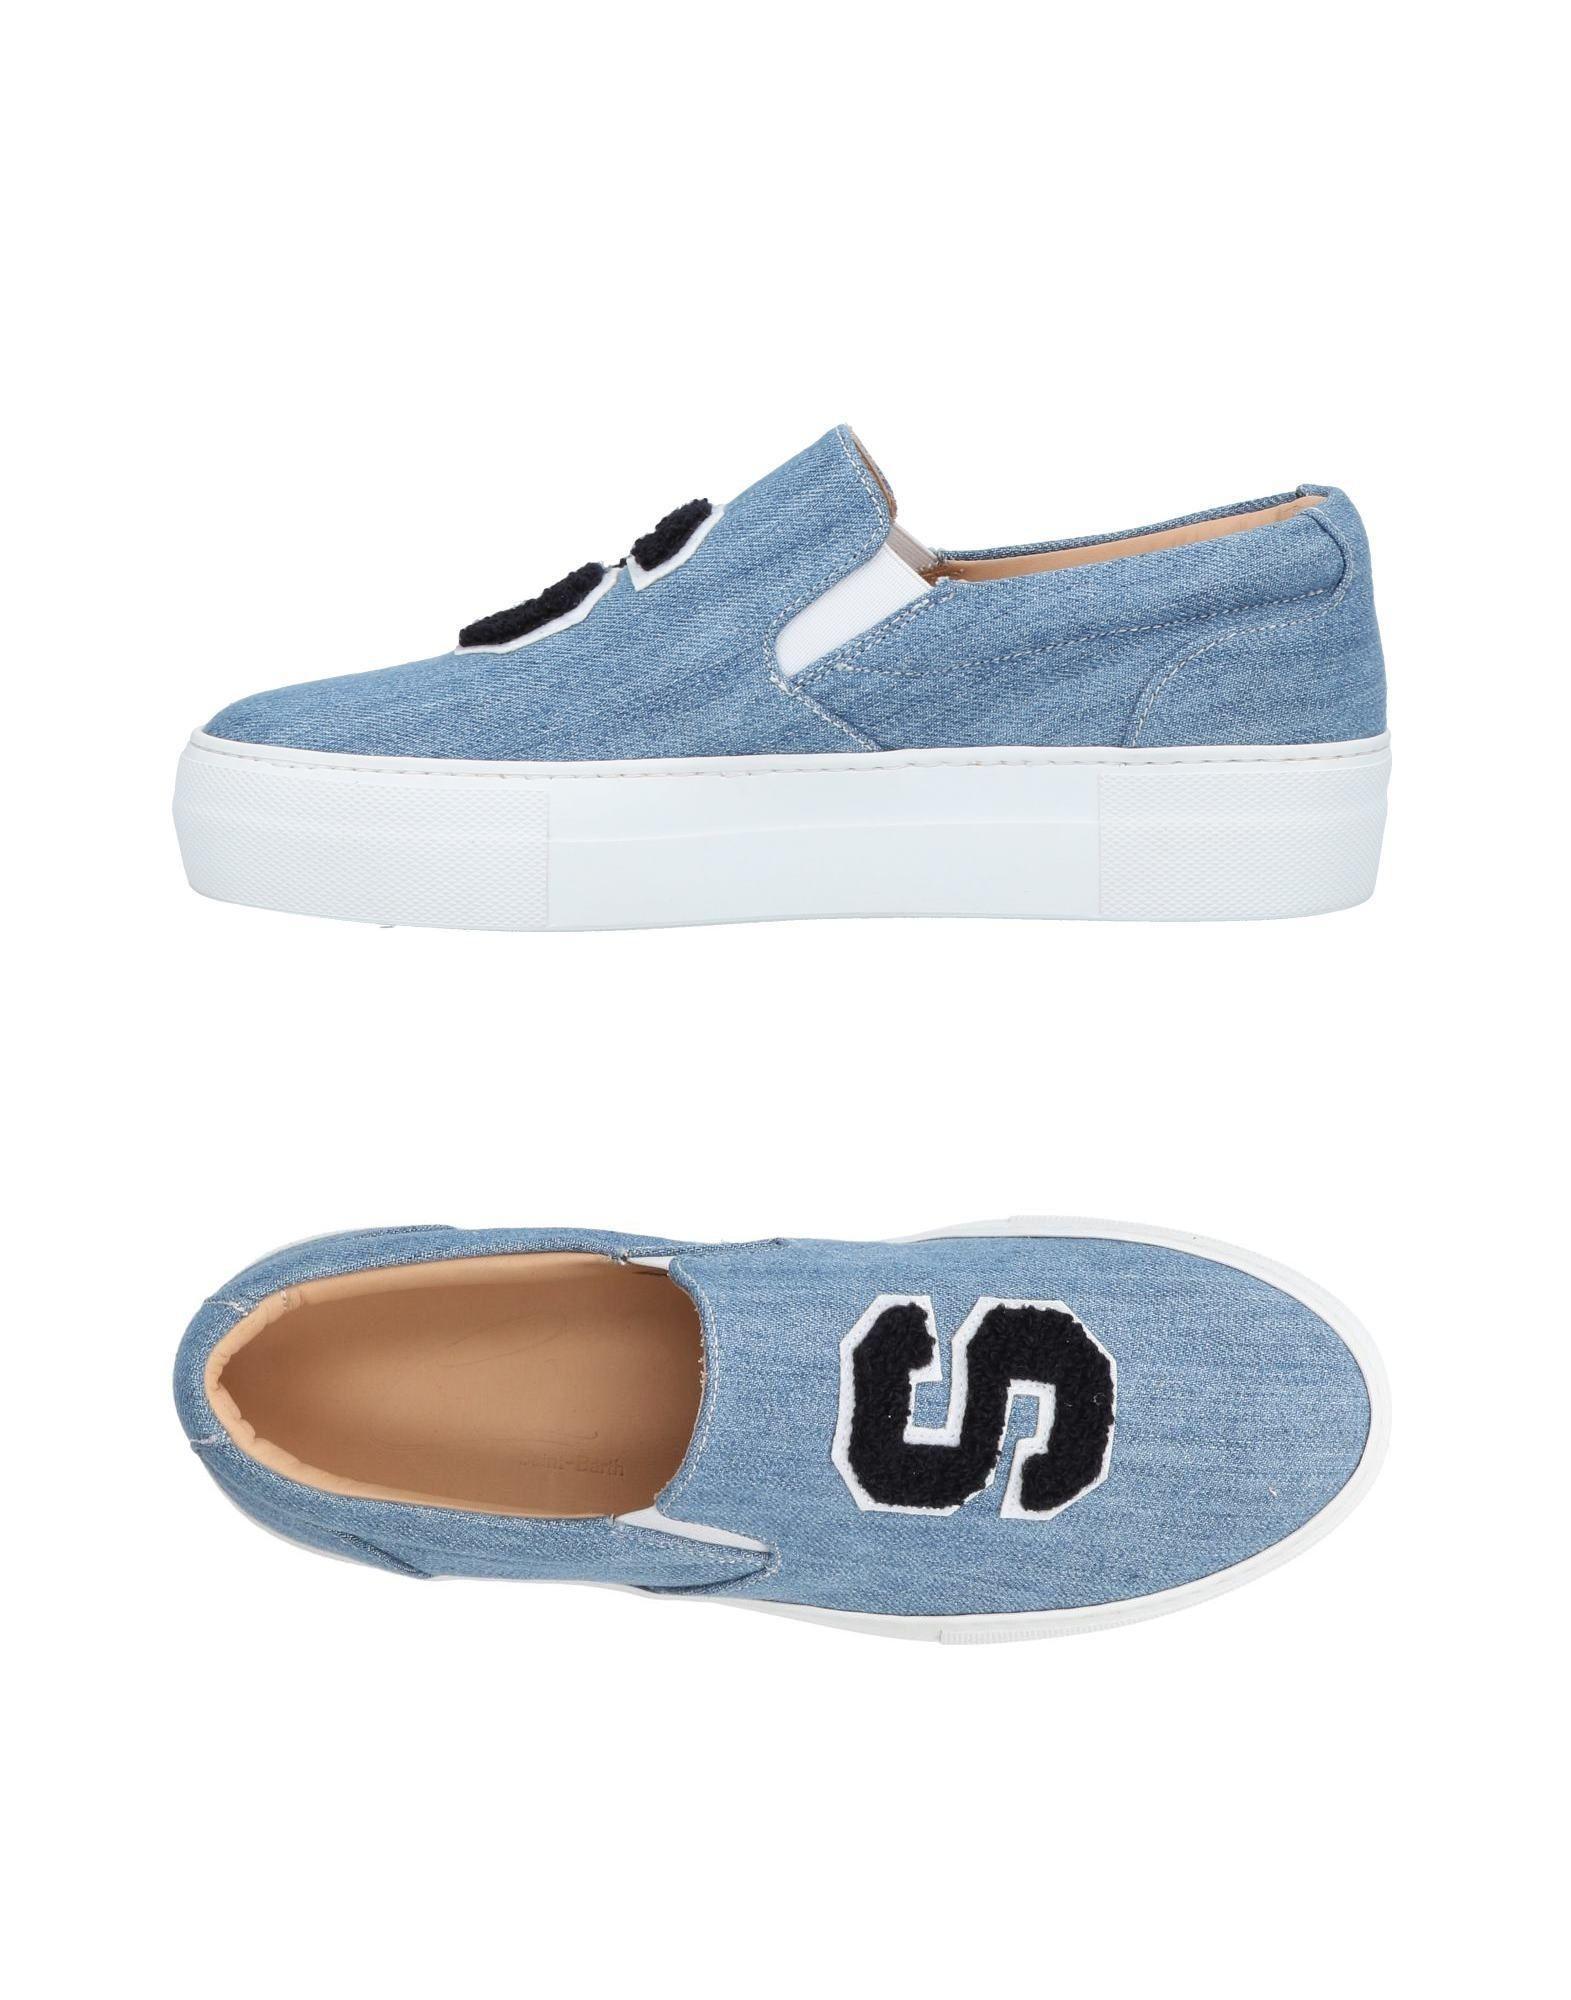 FOOTWEAR - Low-tops & sneakers Carla Saint Barth uPsCpSKauG